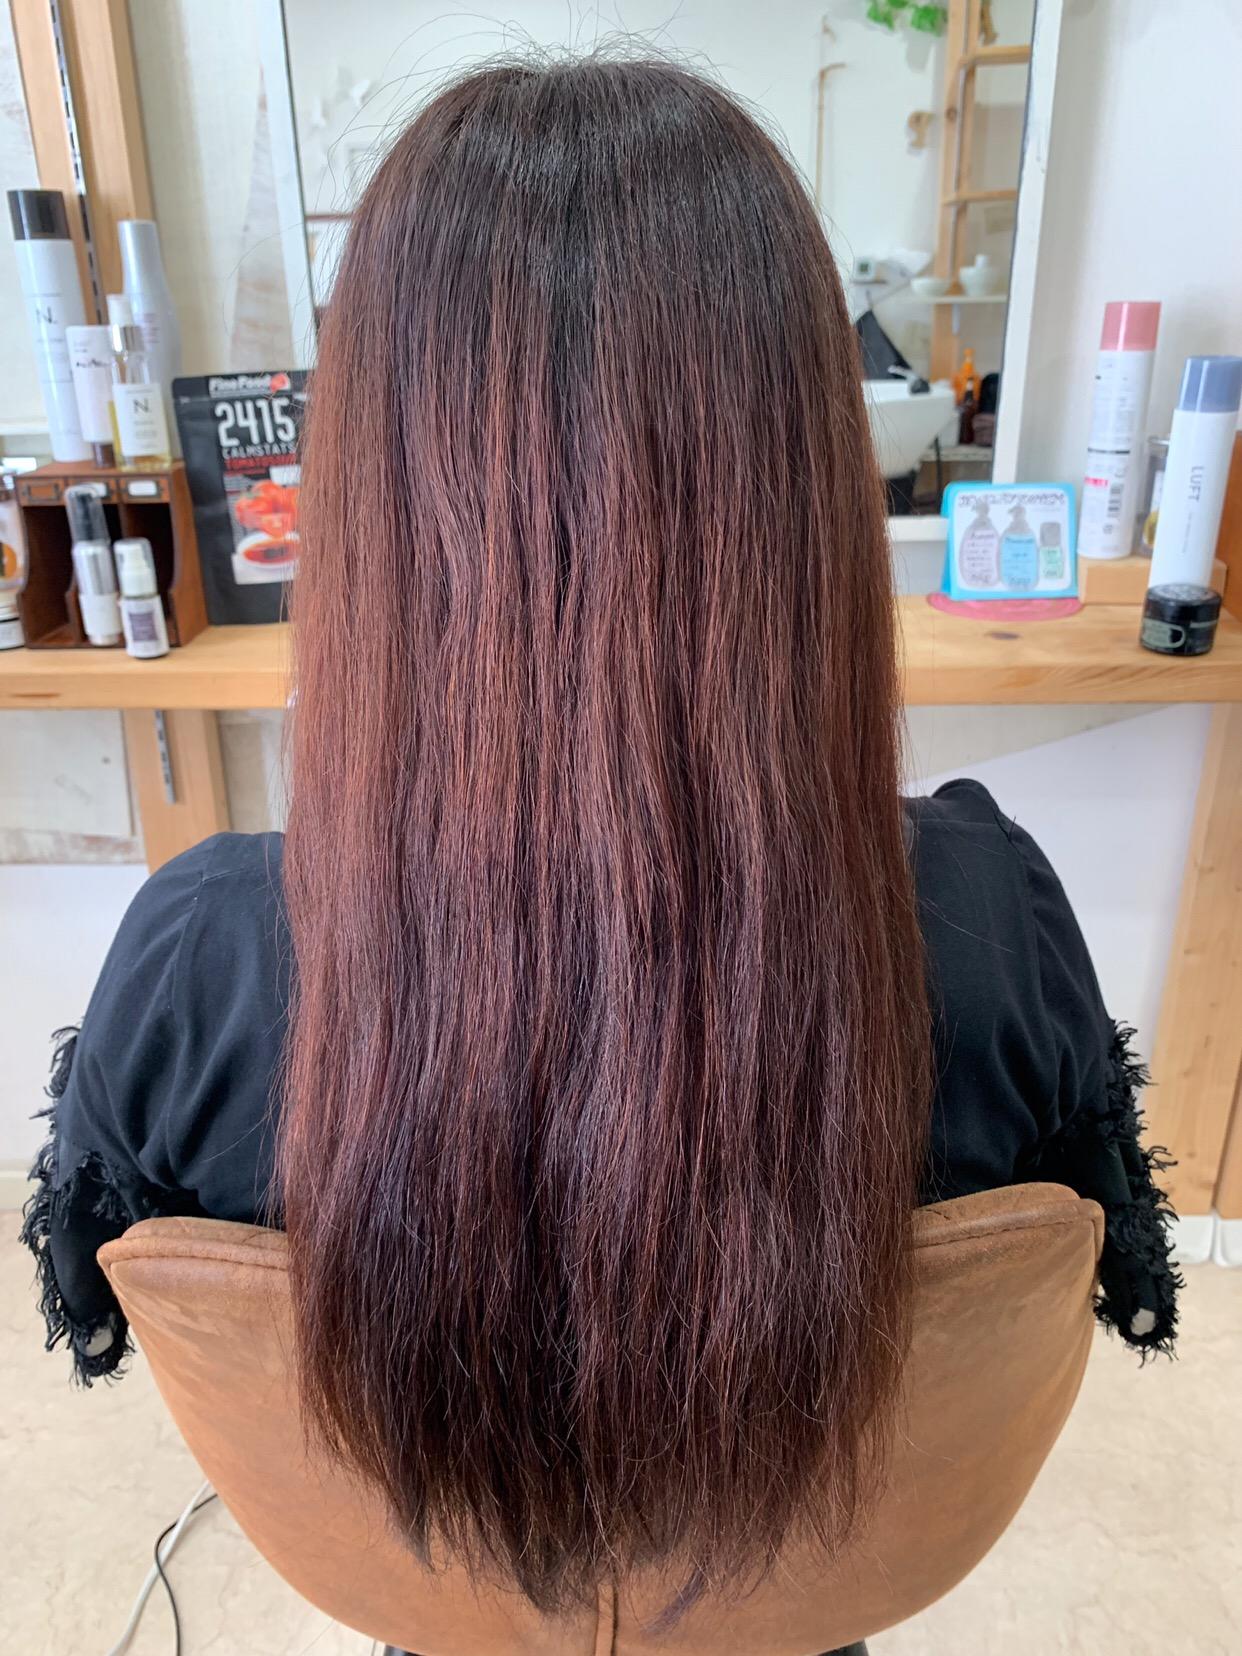 LULUトリートメント×縮毛矯正+LULUトリートメントでつやっつやの艶髪。原宿・表参道『1000人をツヤ髪にヘアケア美容師の挑戦』